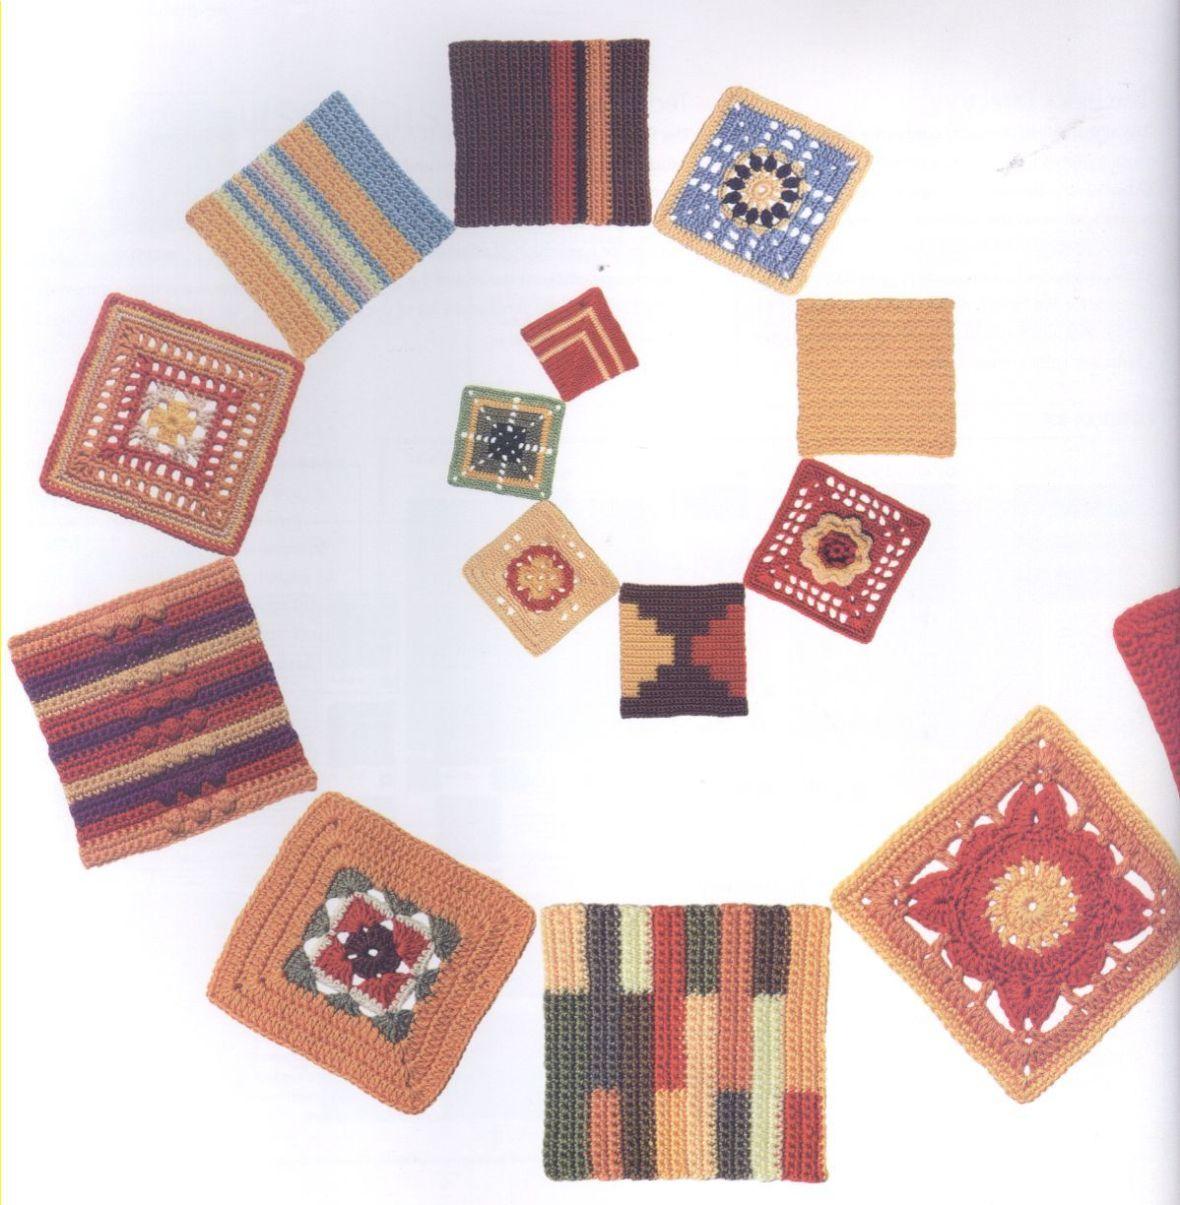 200 Crocheted Blocks for blankets, throws & Afghans 014